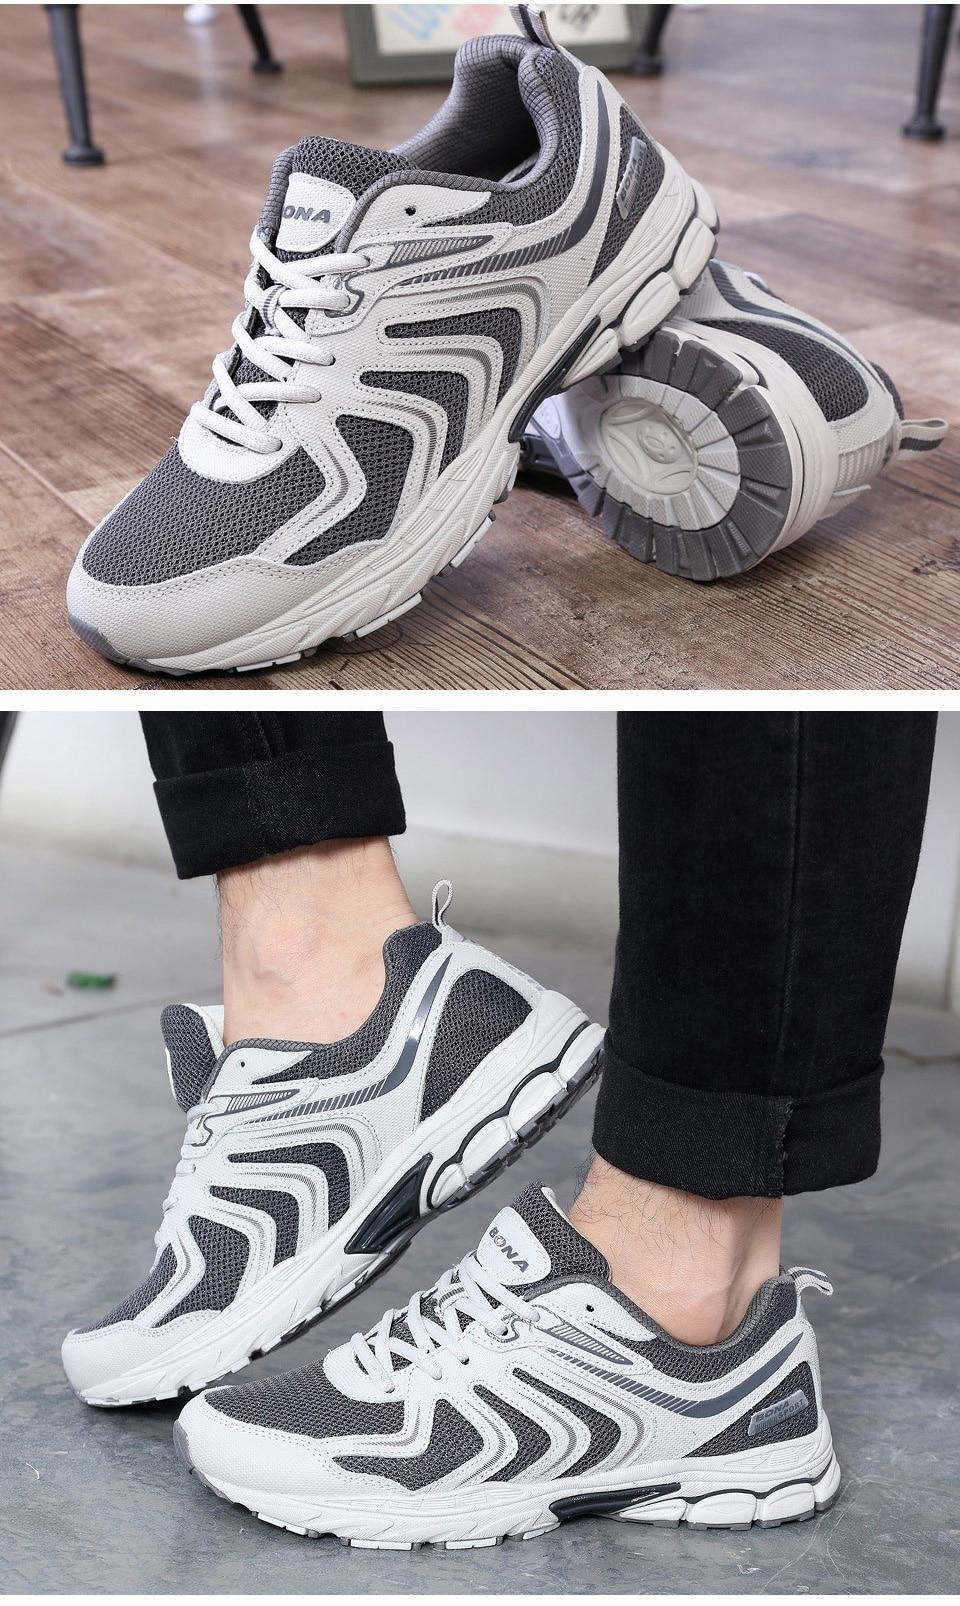 H6f392d701eb9442fb4eb13ad20278df3E BONA New Fashion Style Men shoes Casual Shoes Men Loafers Men Outdoor Sneakers Shoes Mesh Men Flats Free Shipping